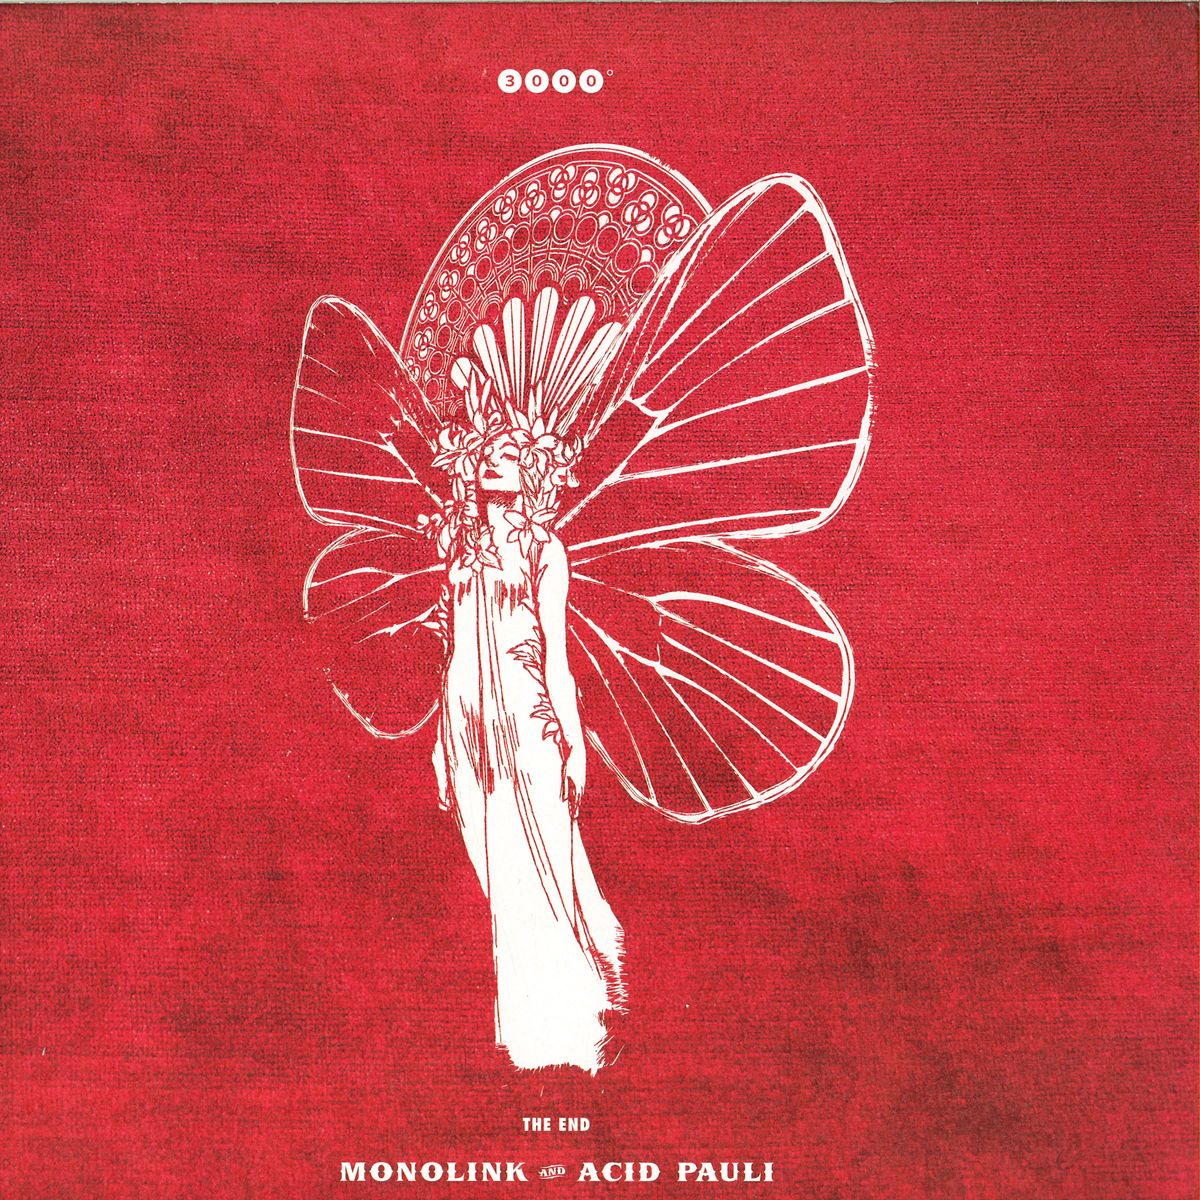 Monolink & Acid Pauli – The End (3000° Records)